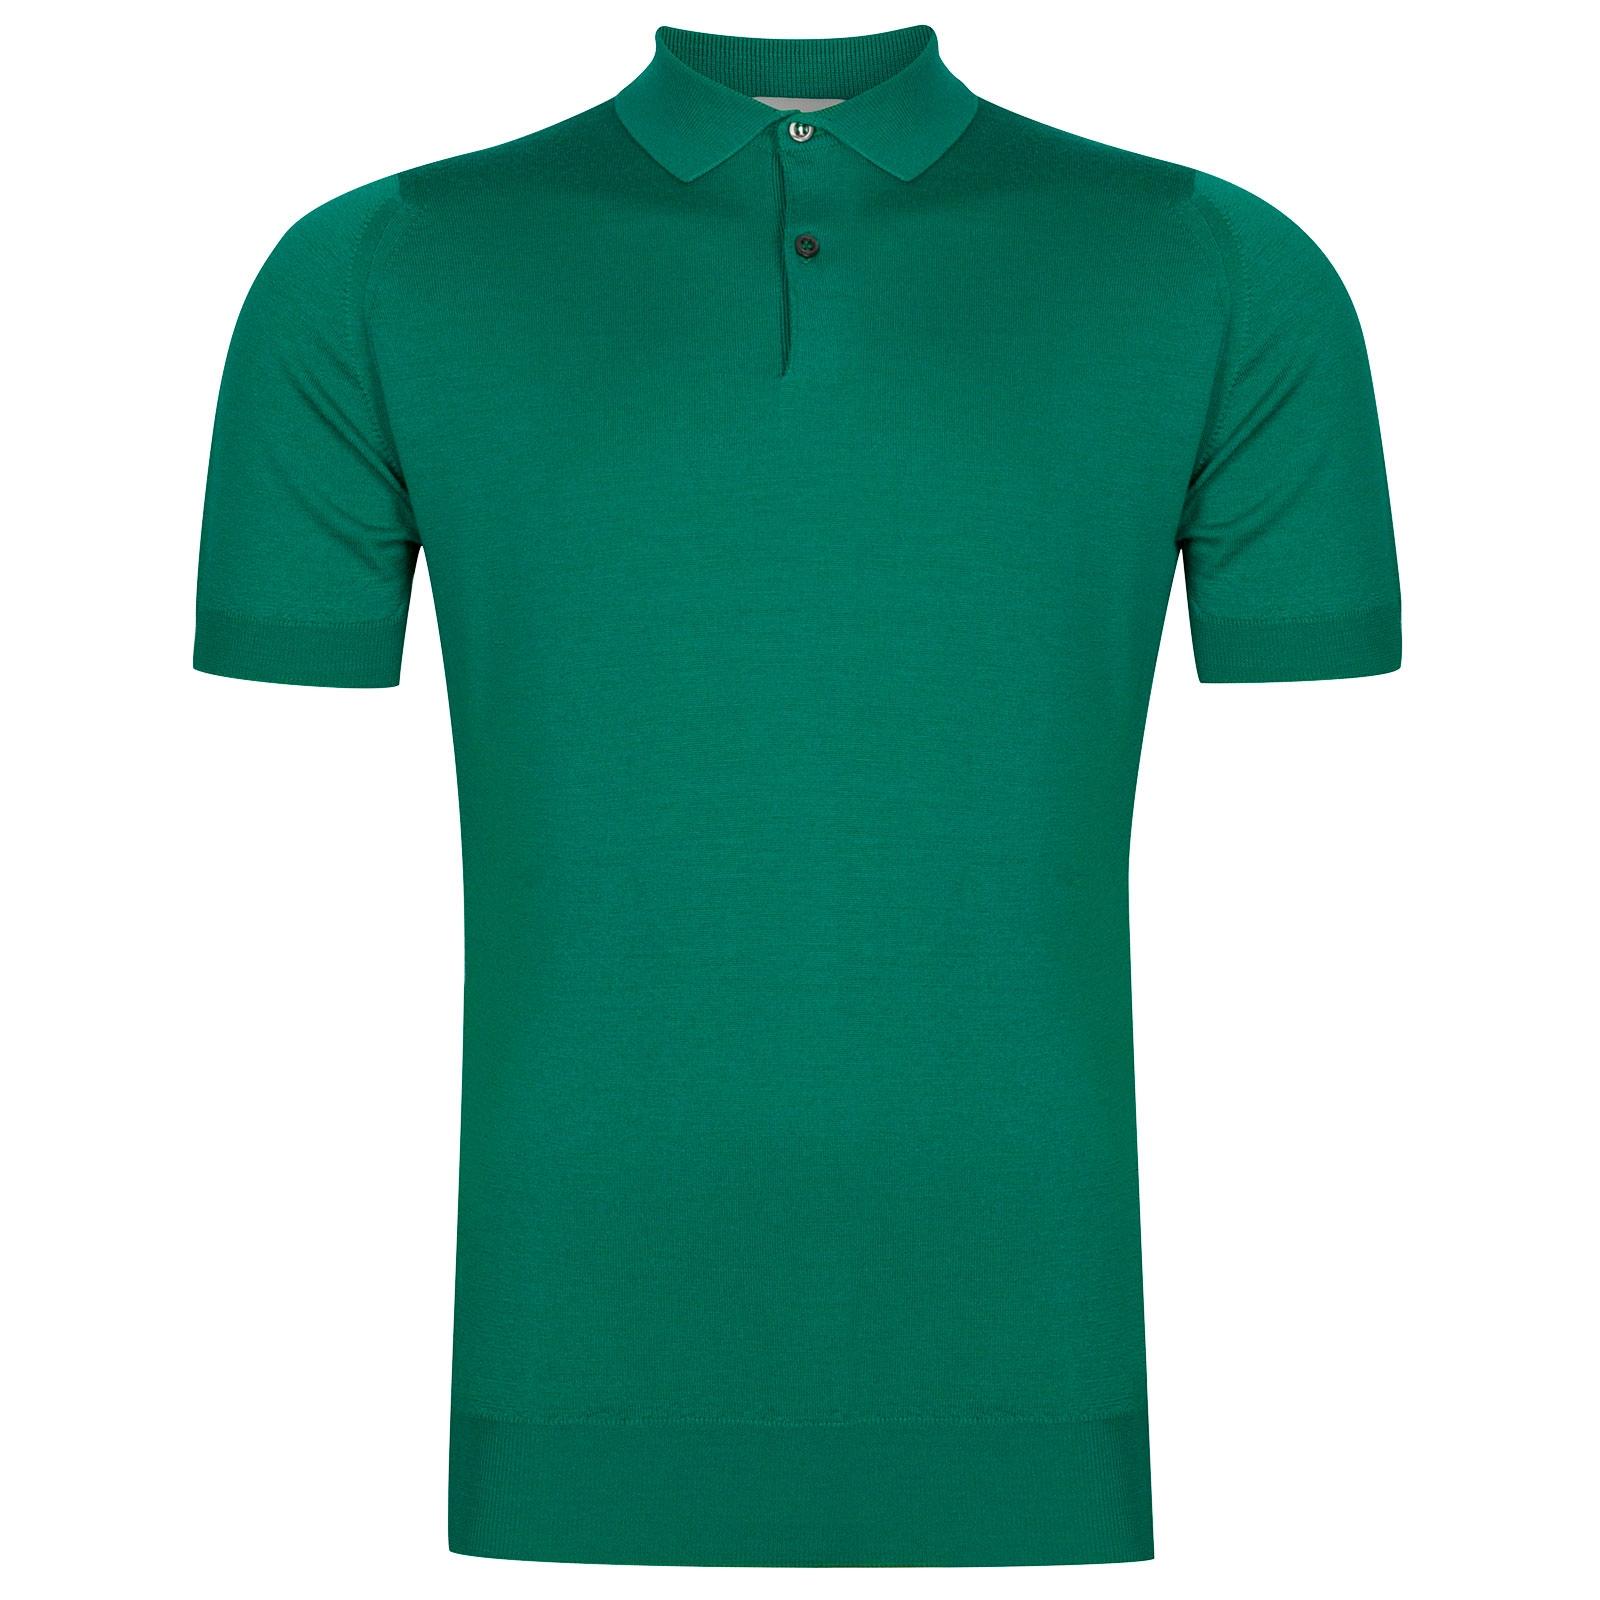 John Smedley Payton Merino Wool Shirt in Boron Green-L